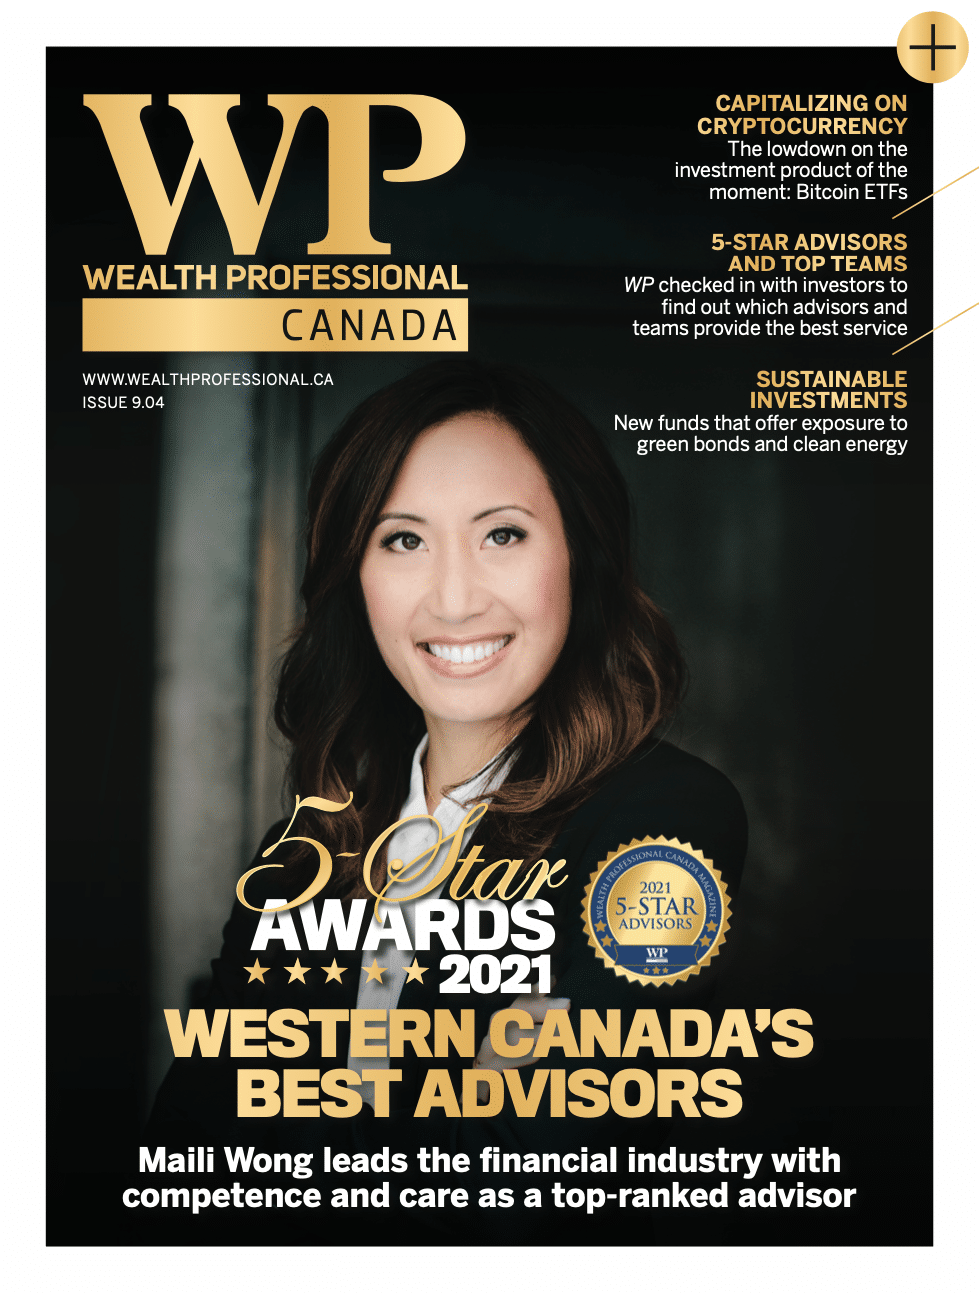 Five Star Best Advisors in Western Canada – Maili Wong